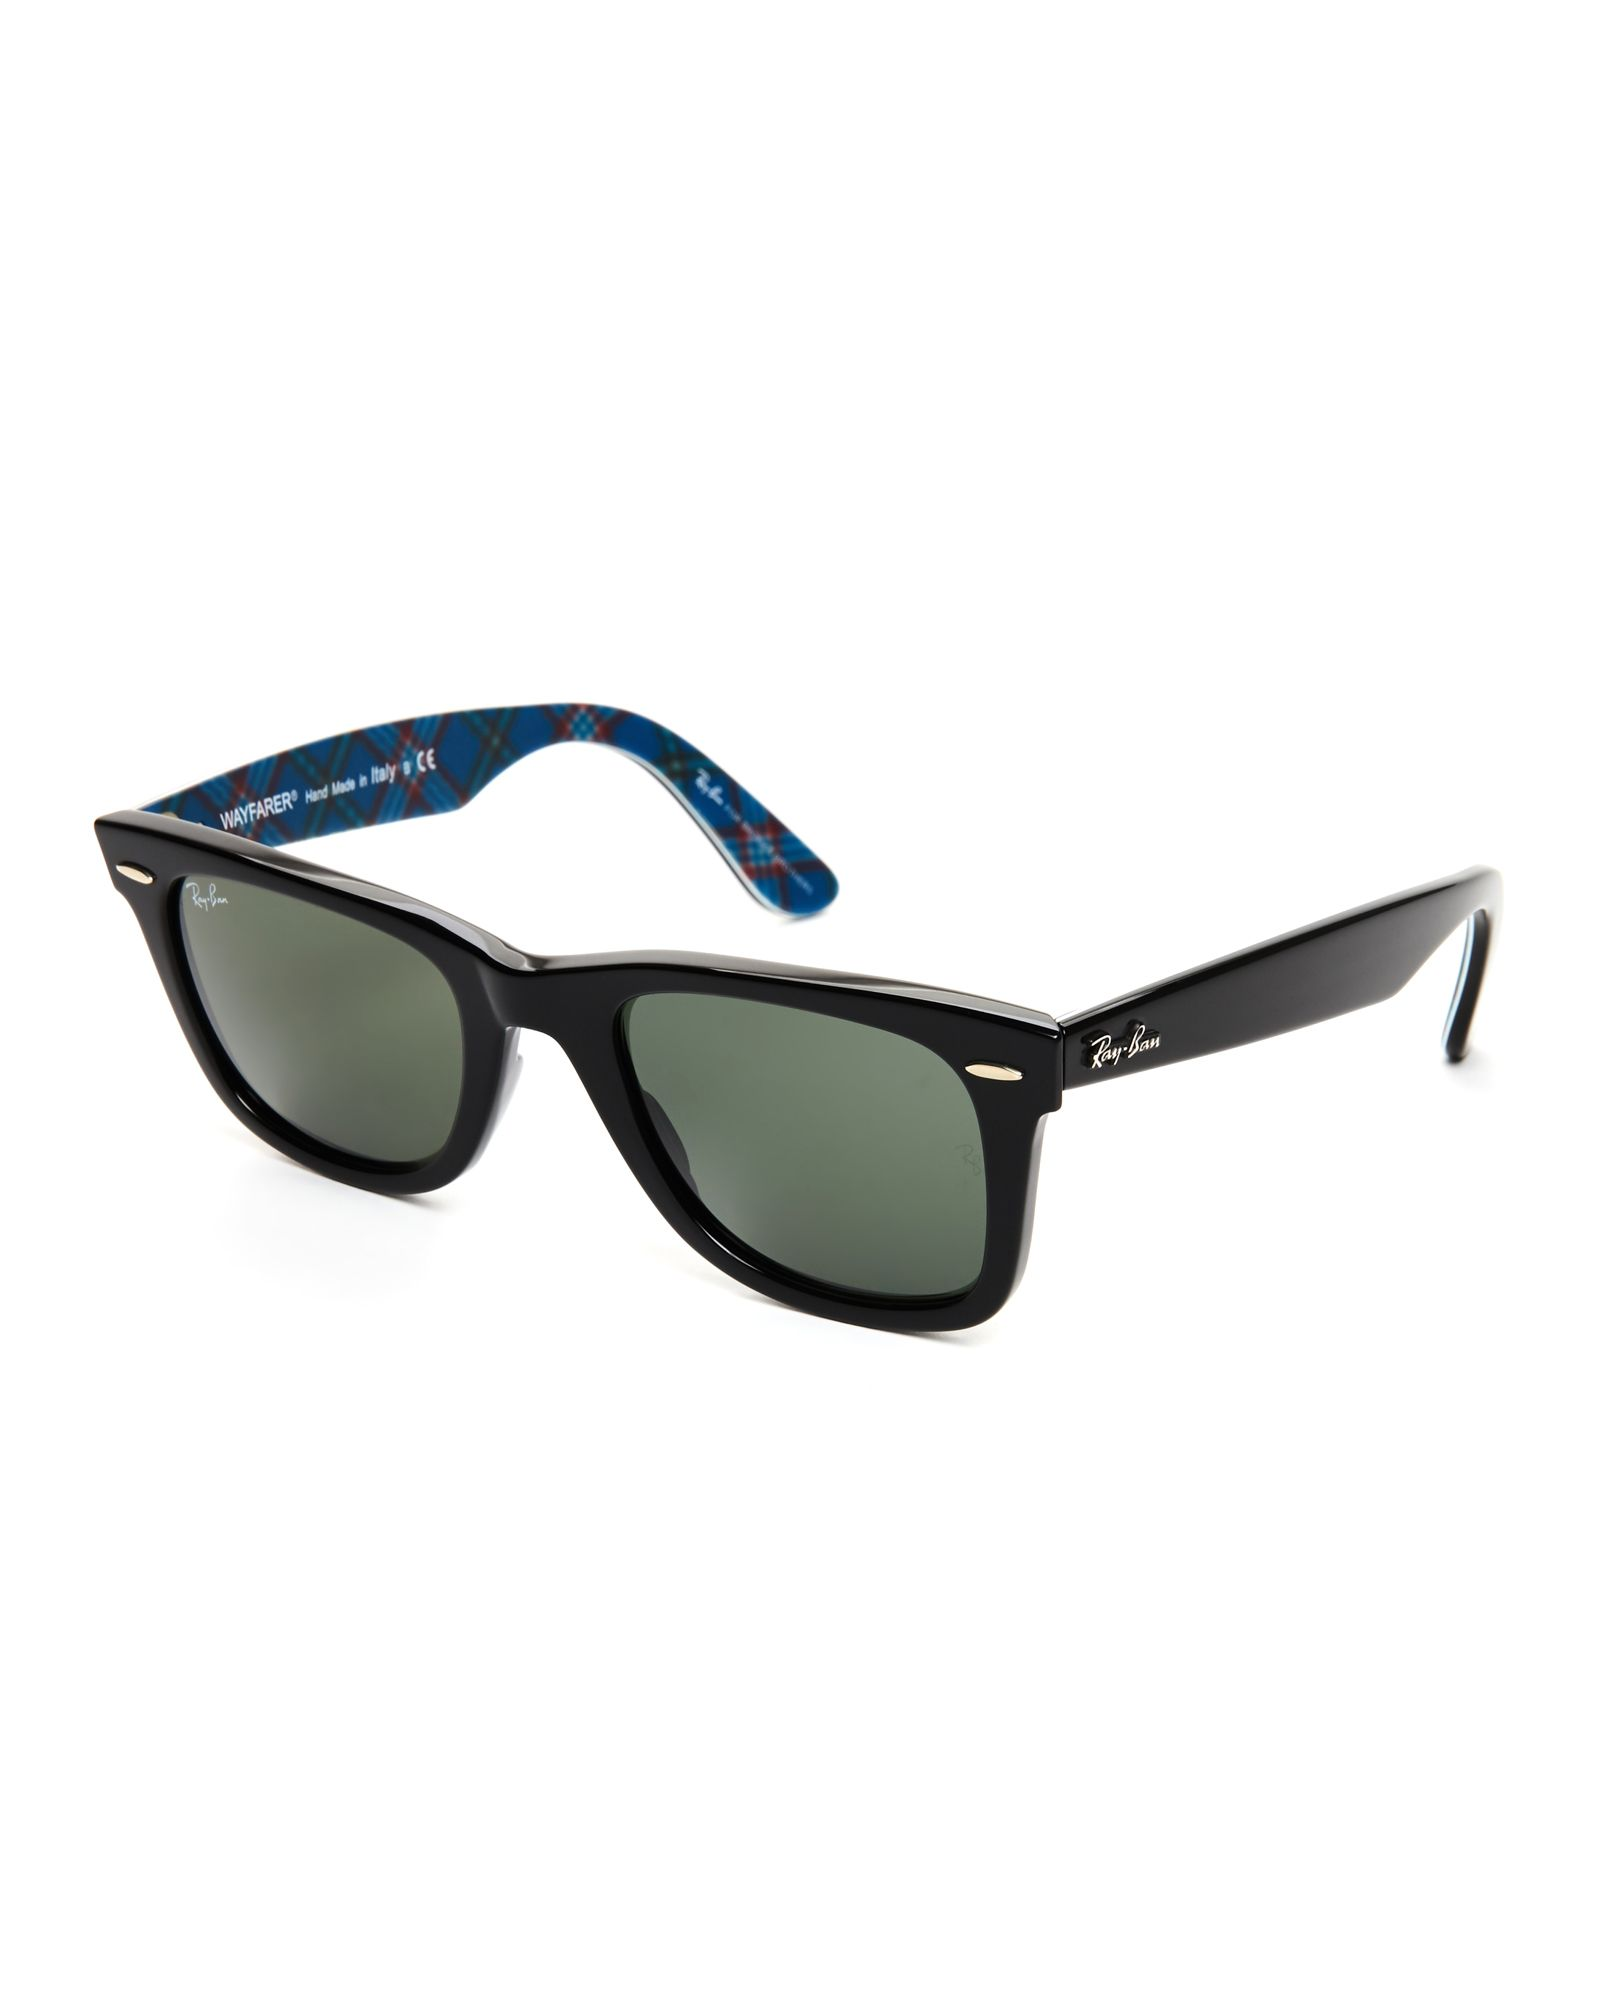 2f133e149 Ray-Ban Black RB2140 Wayfarer Sunglasses | *Apparel & Accessories ...